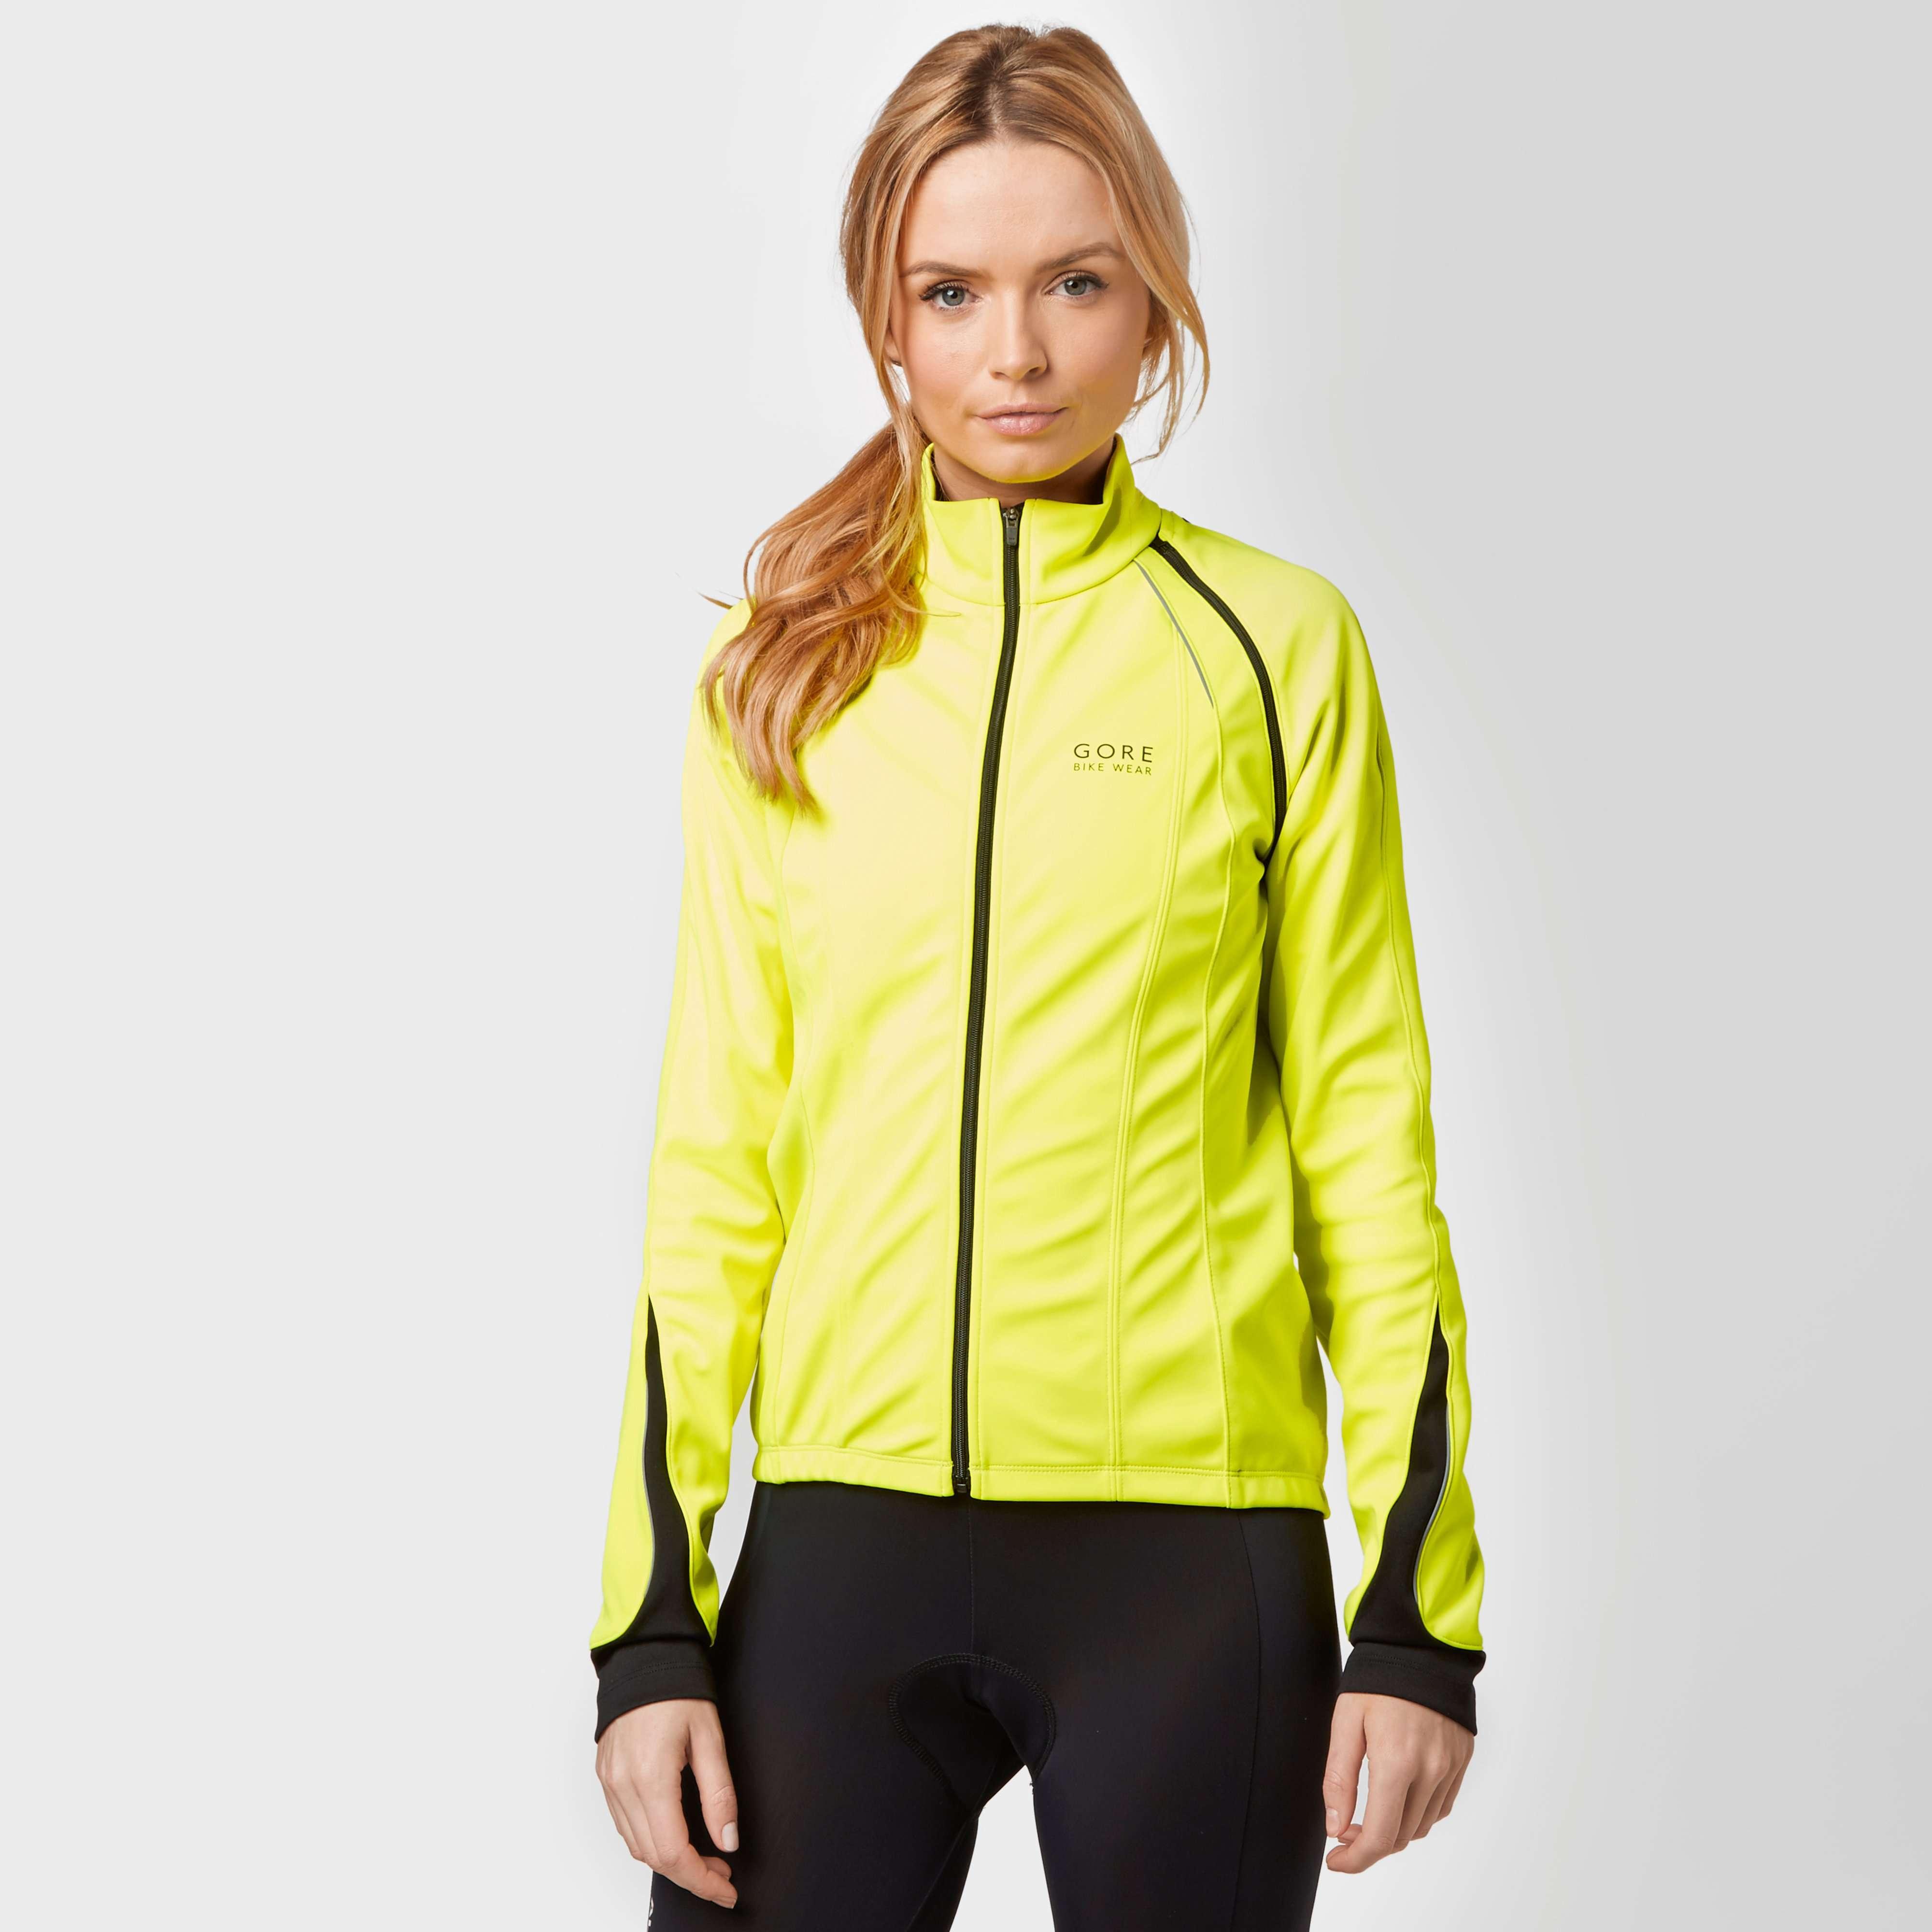 GORE Women's Phantom Softshell Jacket